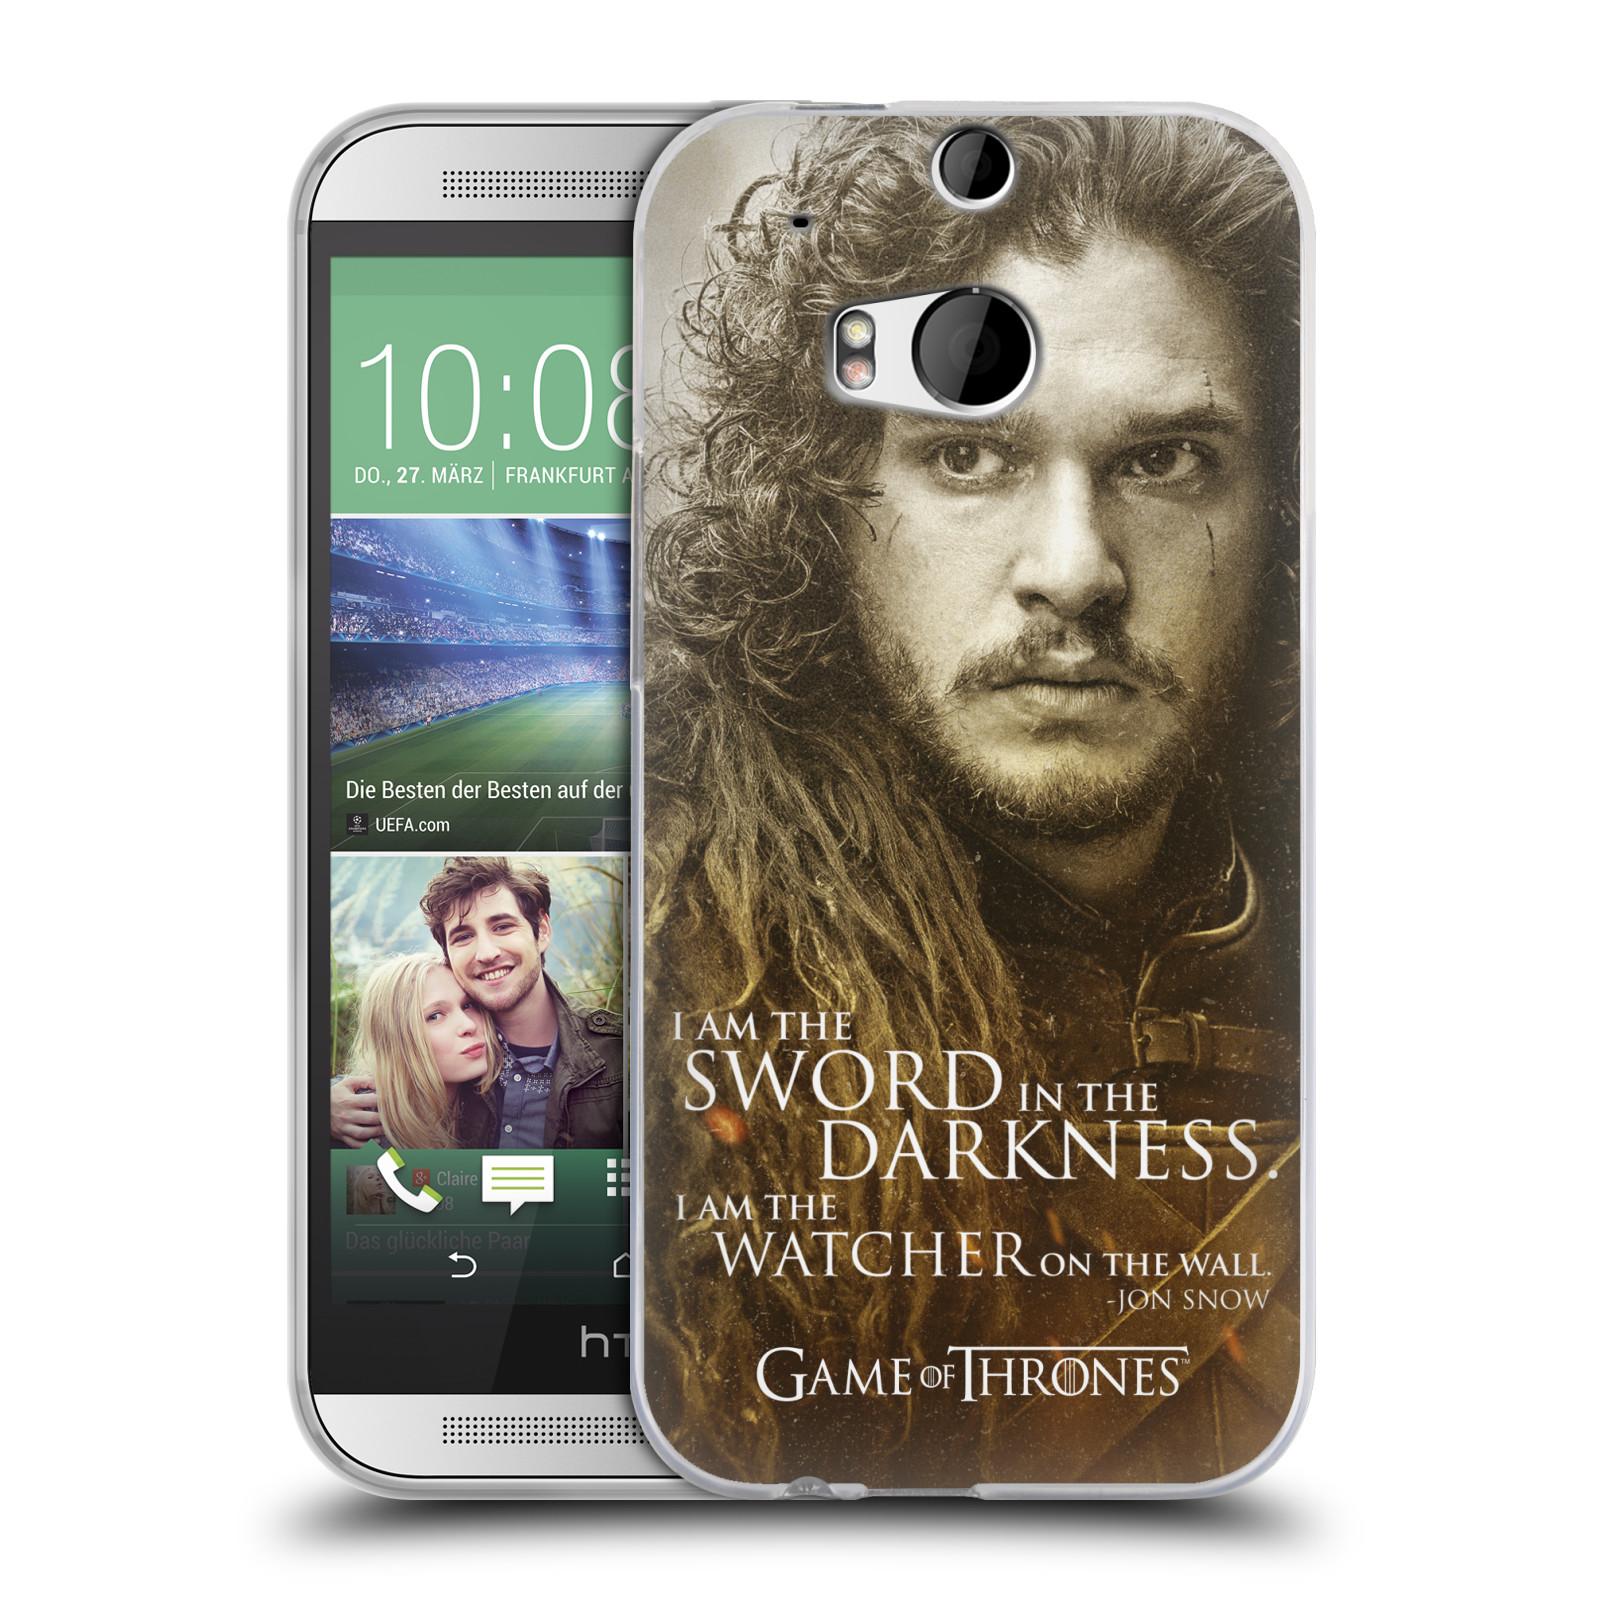 Silikonové pouzdro na mobil HTC ONE M8 HEAD CASE Hra o trůny - Jon Snow (Silikonový kryt či obal na mobilní telefon s licencovaným motivem Hra o trůny - Game Of Thrones pro HTC ONE M8)